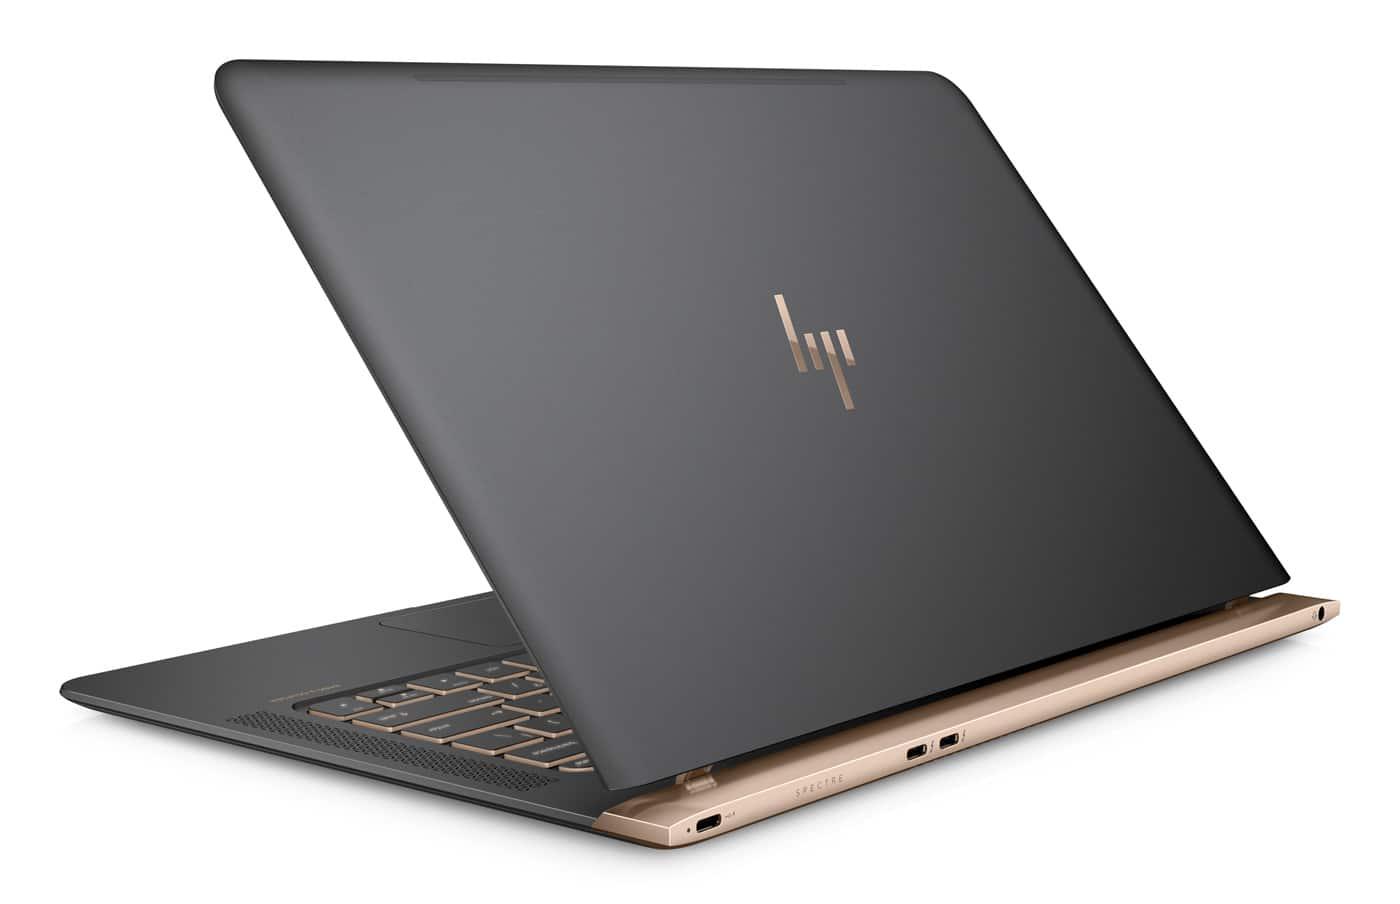 HP Spectre 13-v109nf, Ultrabook 13 pouces IPS i5 SSD 512 8 Go 1309€